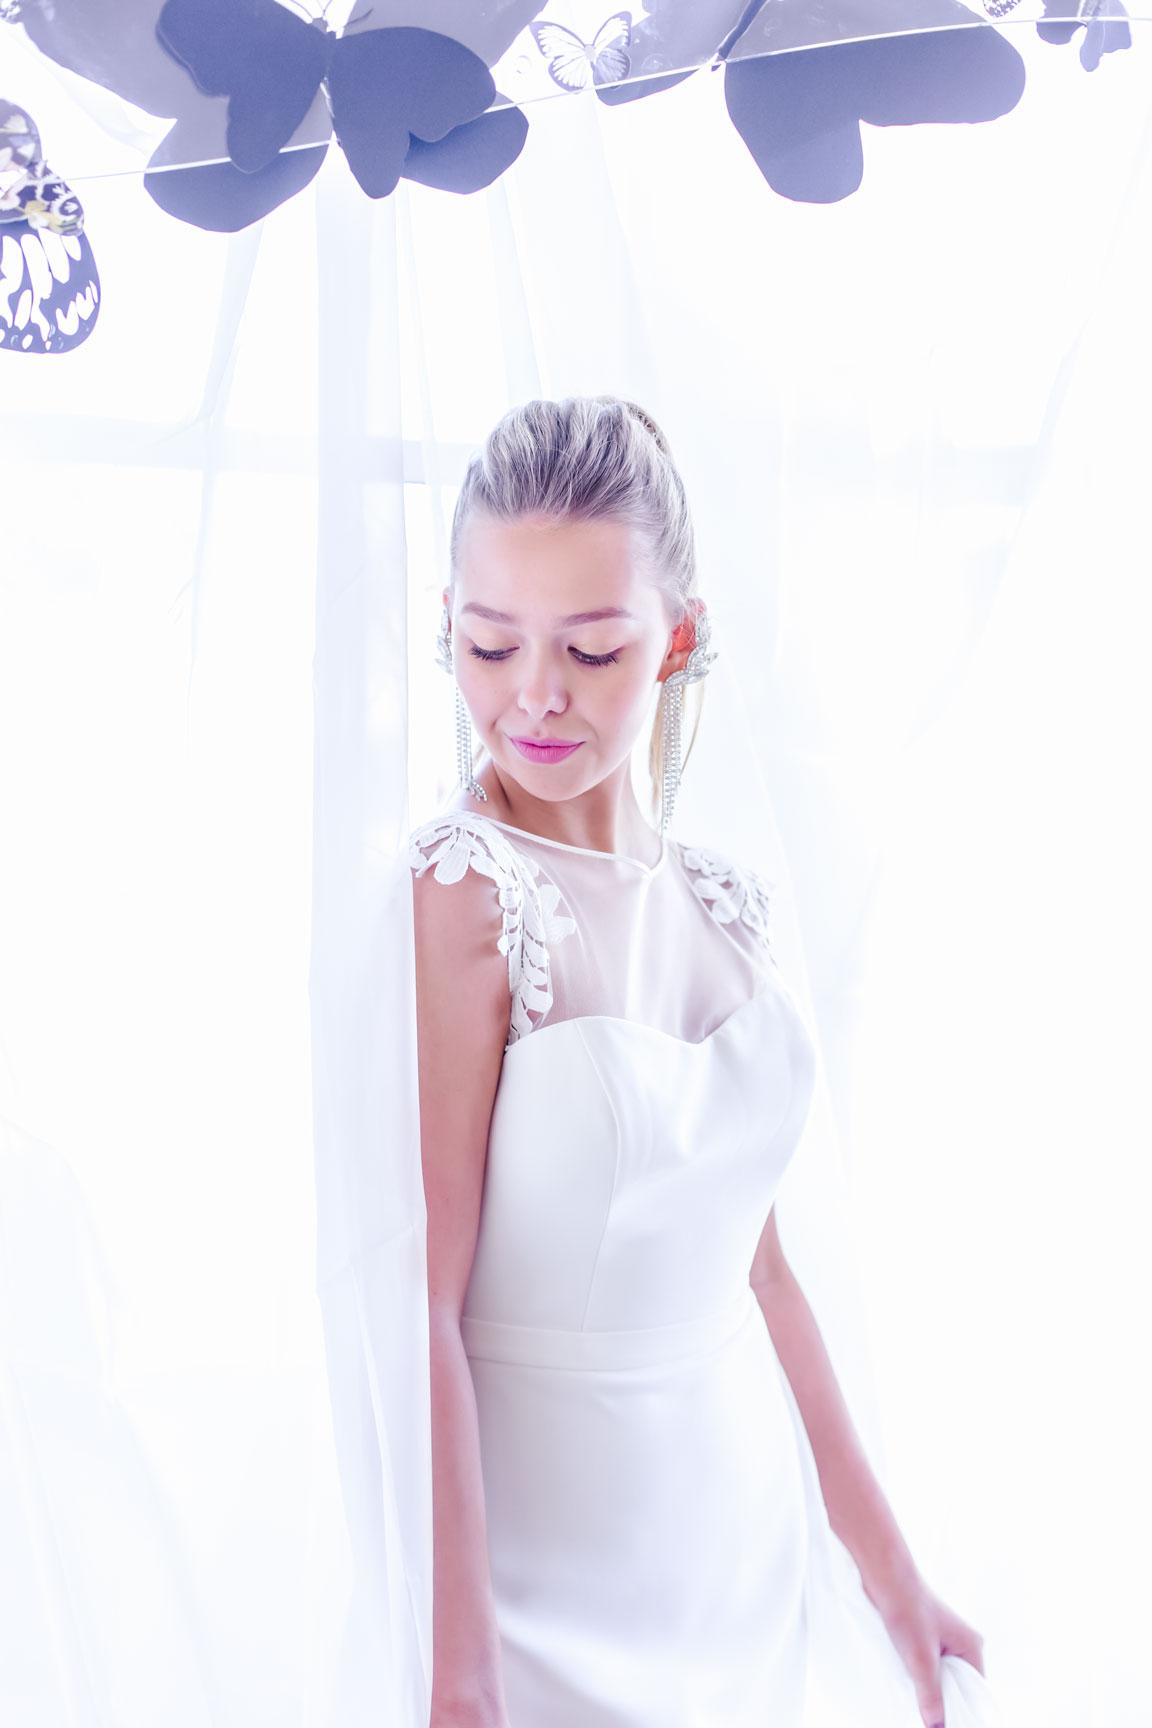 May & Grace Bridal - 3 alternative bridal looks 10 - modern bride